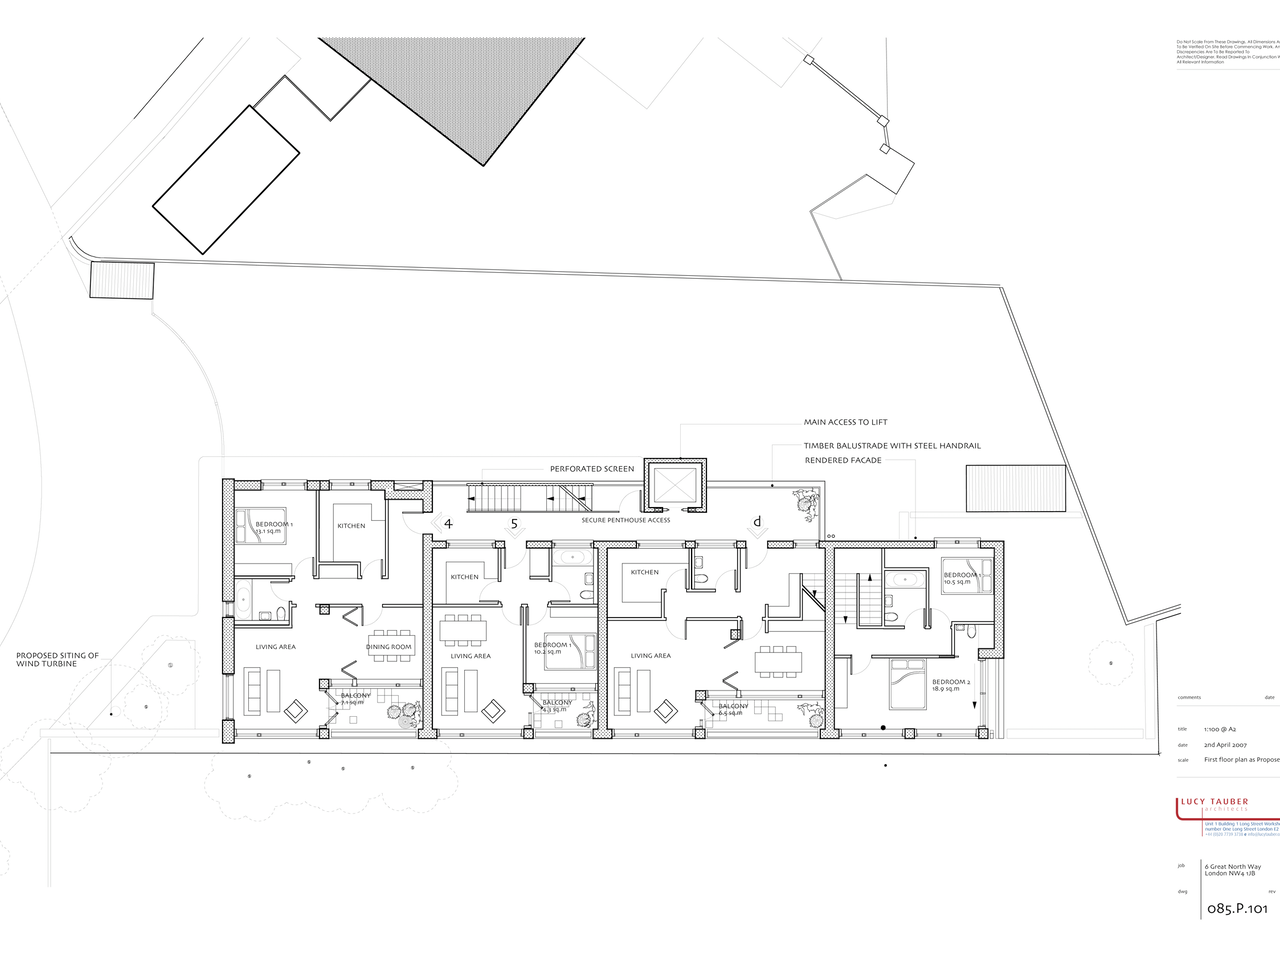 085.p.101 First Floor Plan Copy